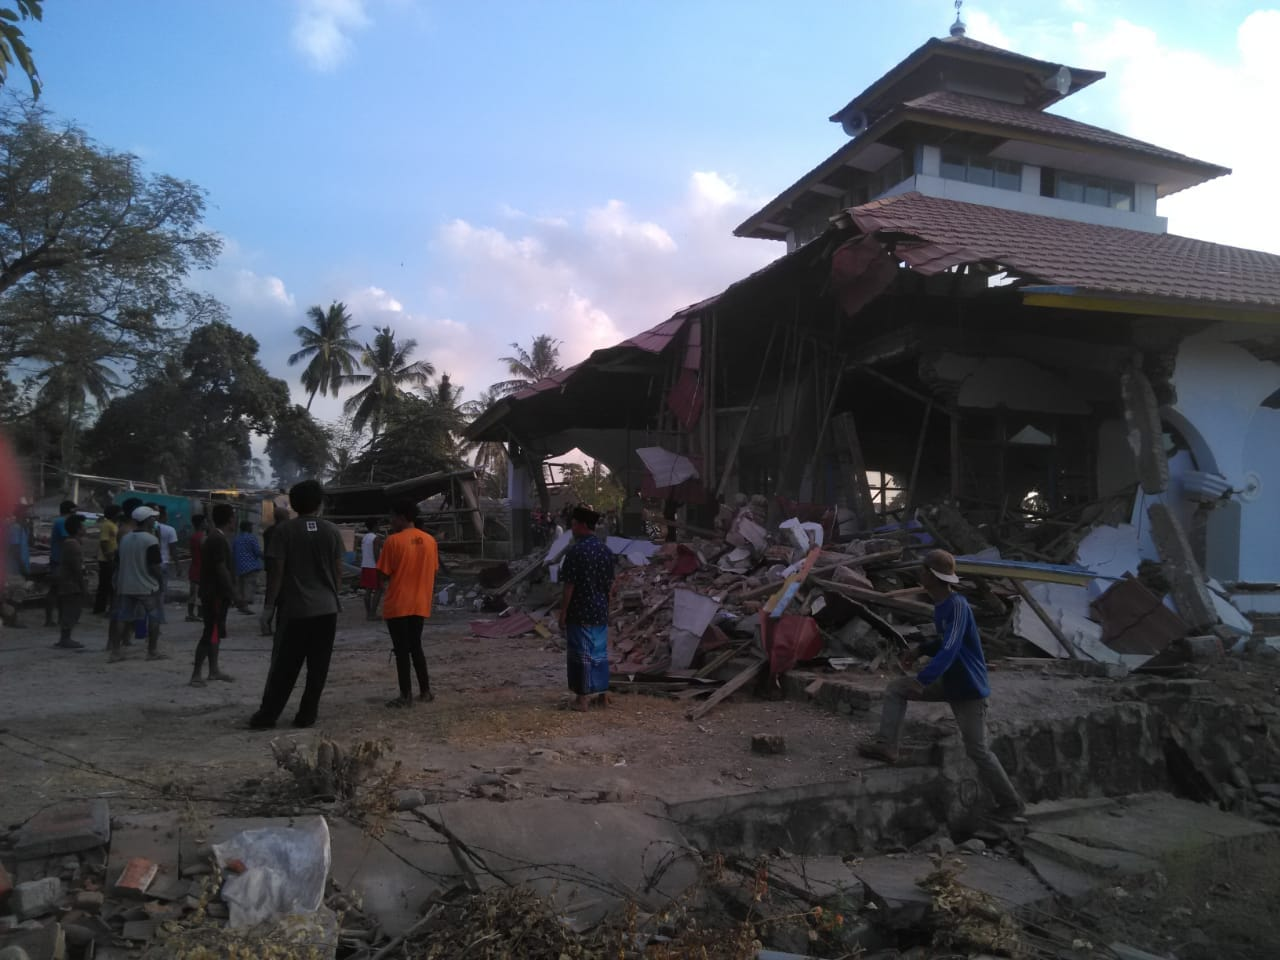 Susah Pinjam Alat Berat, Warga dan Relawan Rubuhkan Masjid dengan Tangan Kosong